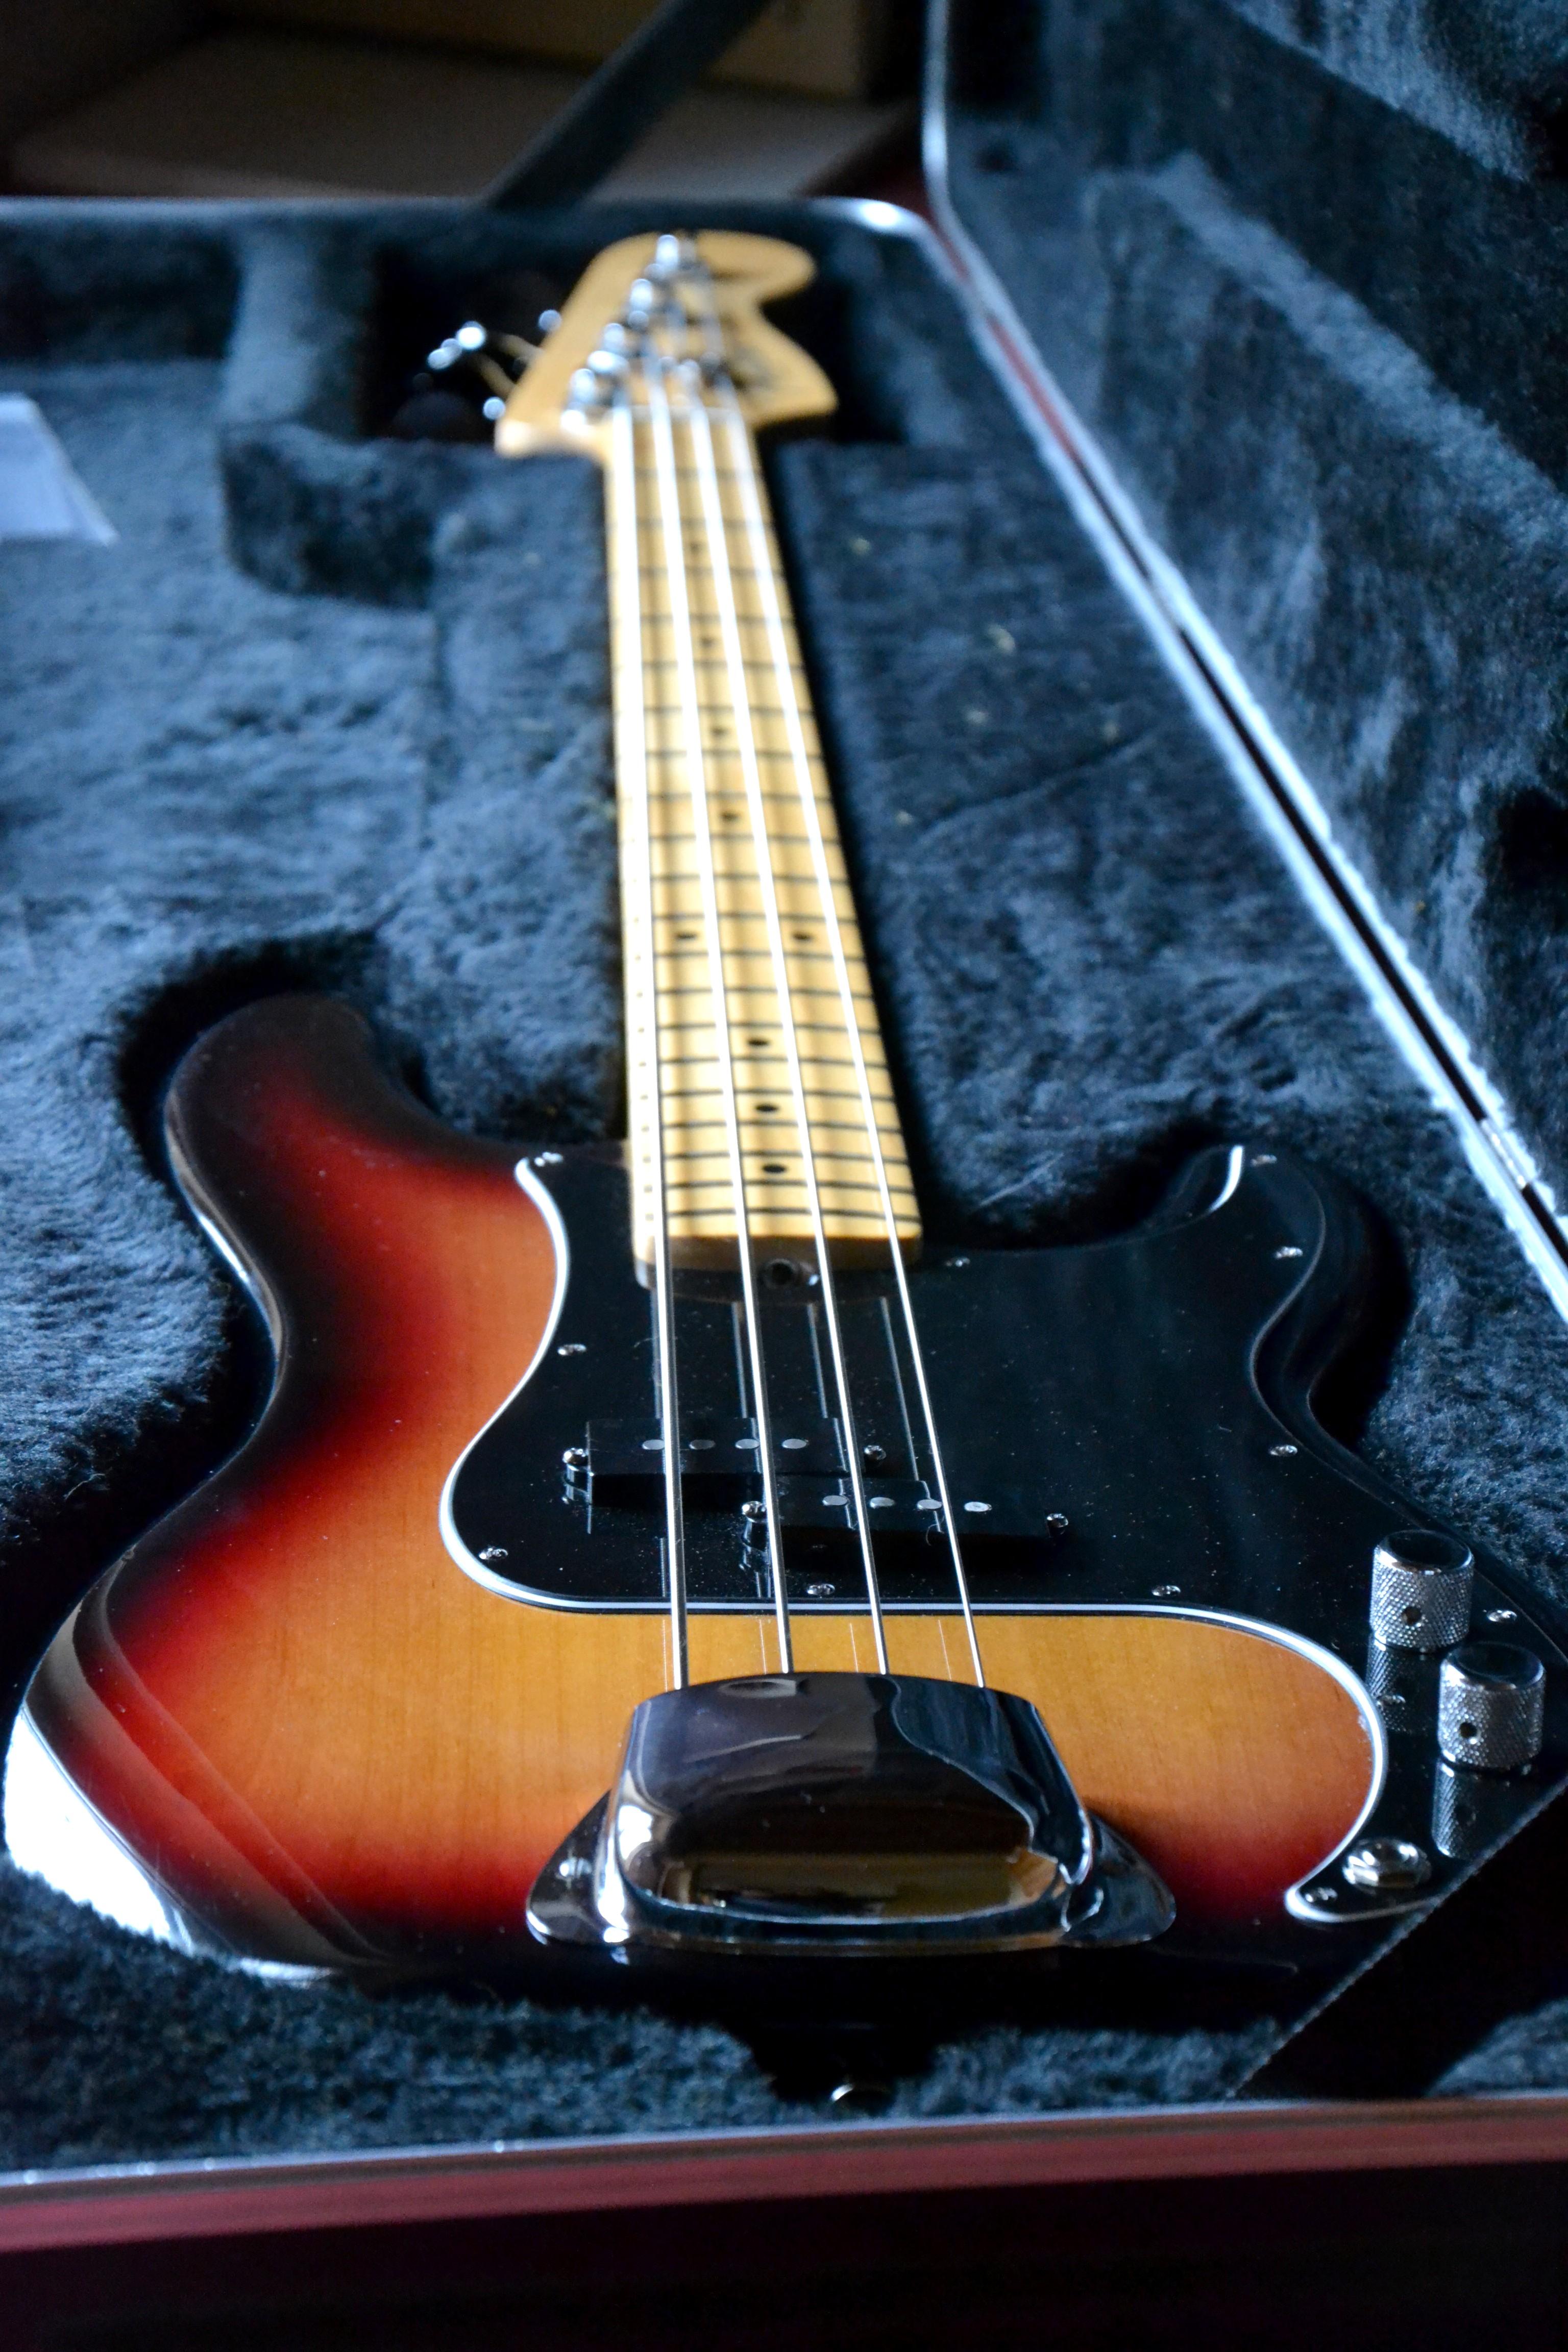 Fender American Standard Precision Bass [2008-2012] image (#481767 ...